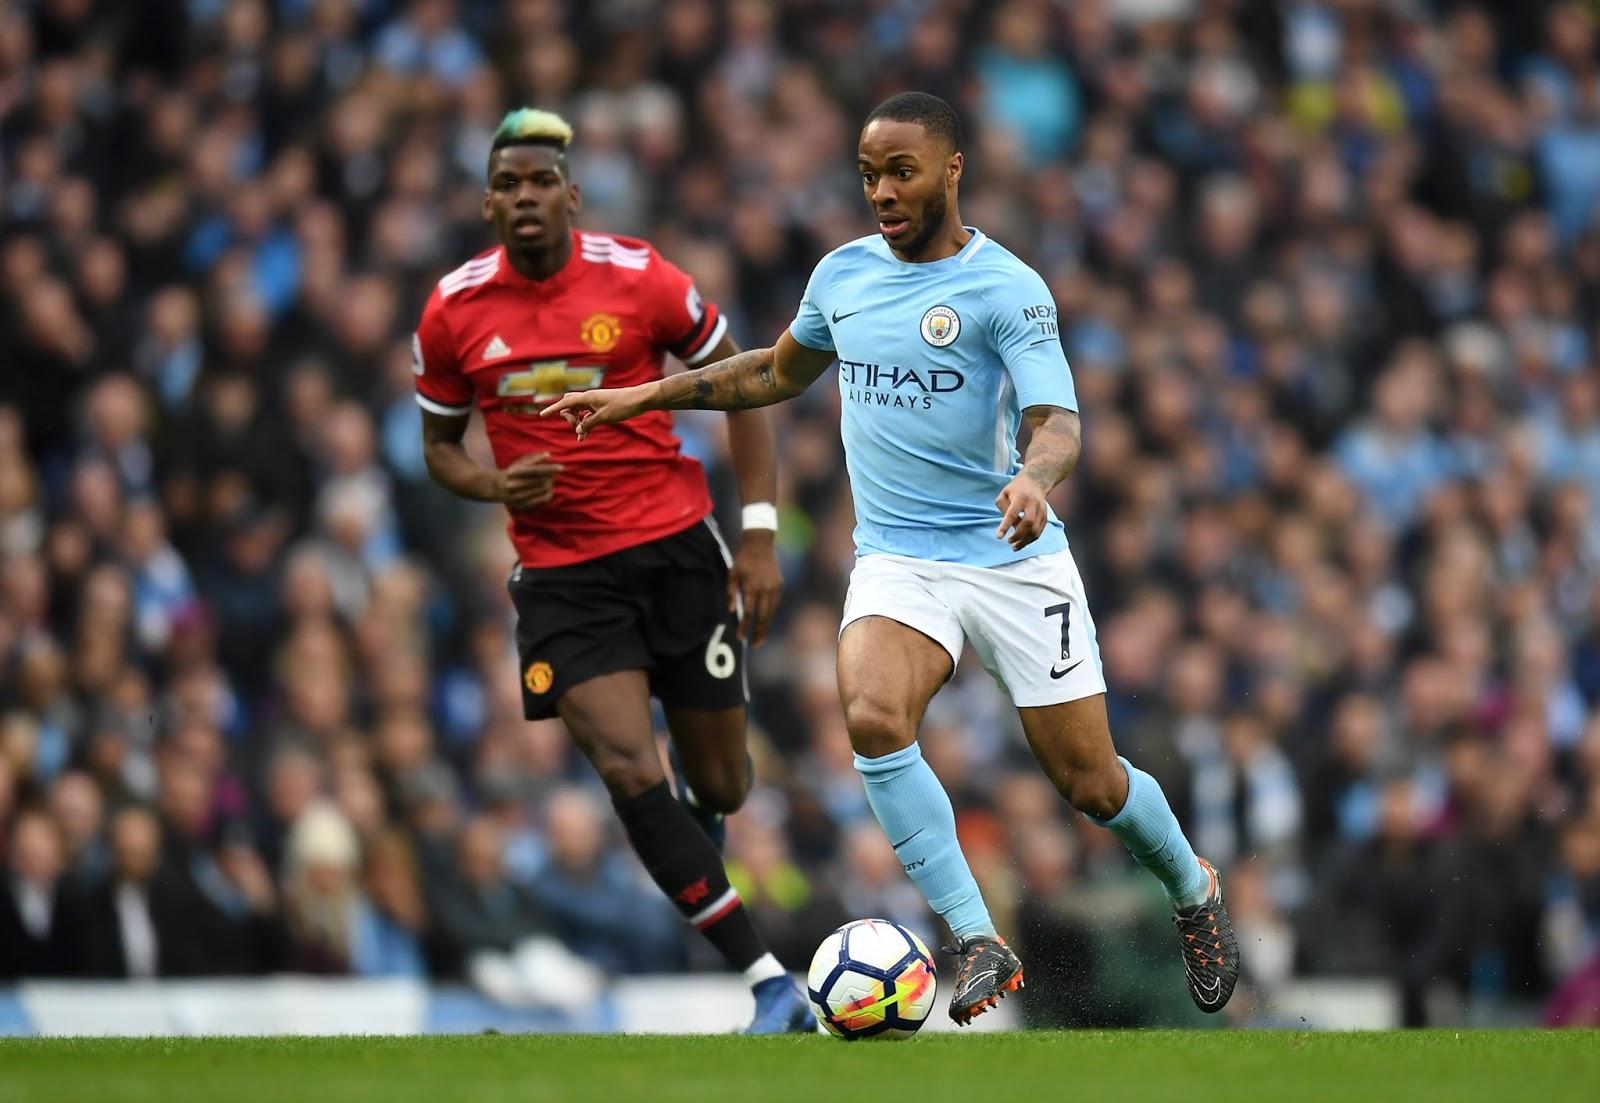 Laporan Pertandingan di Etihad Stadium: Manchester City 2-3 Manchester United